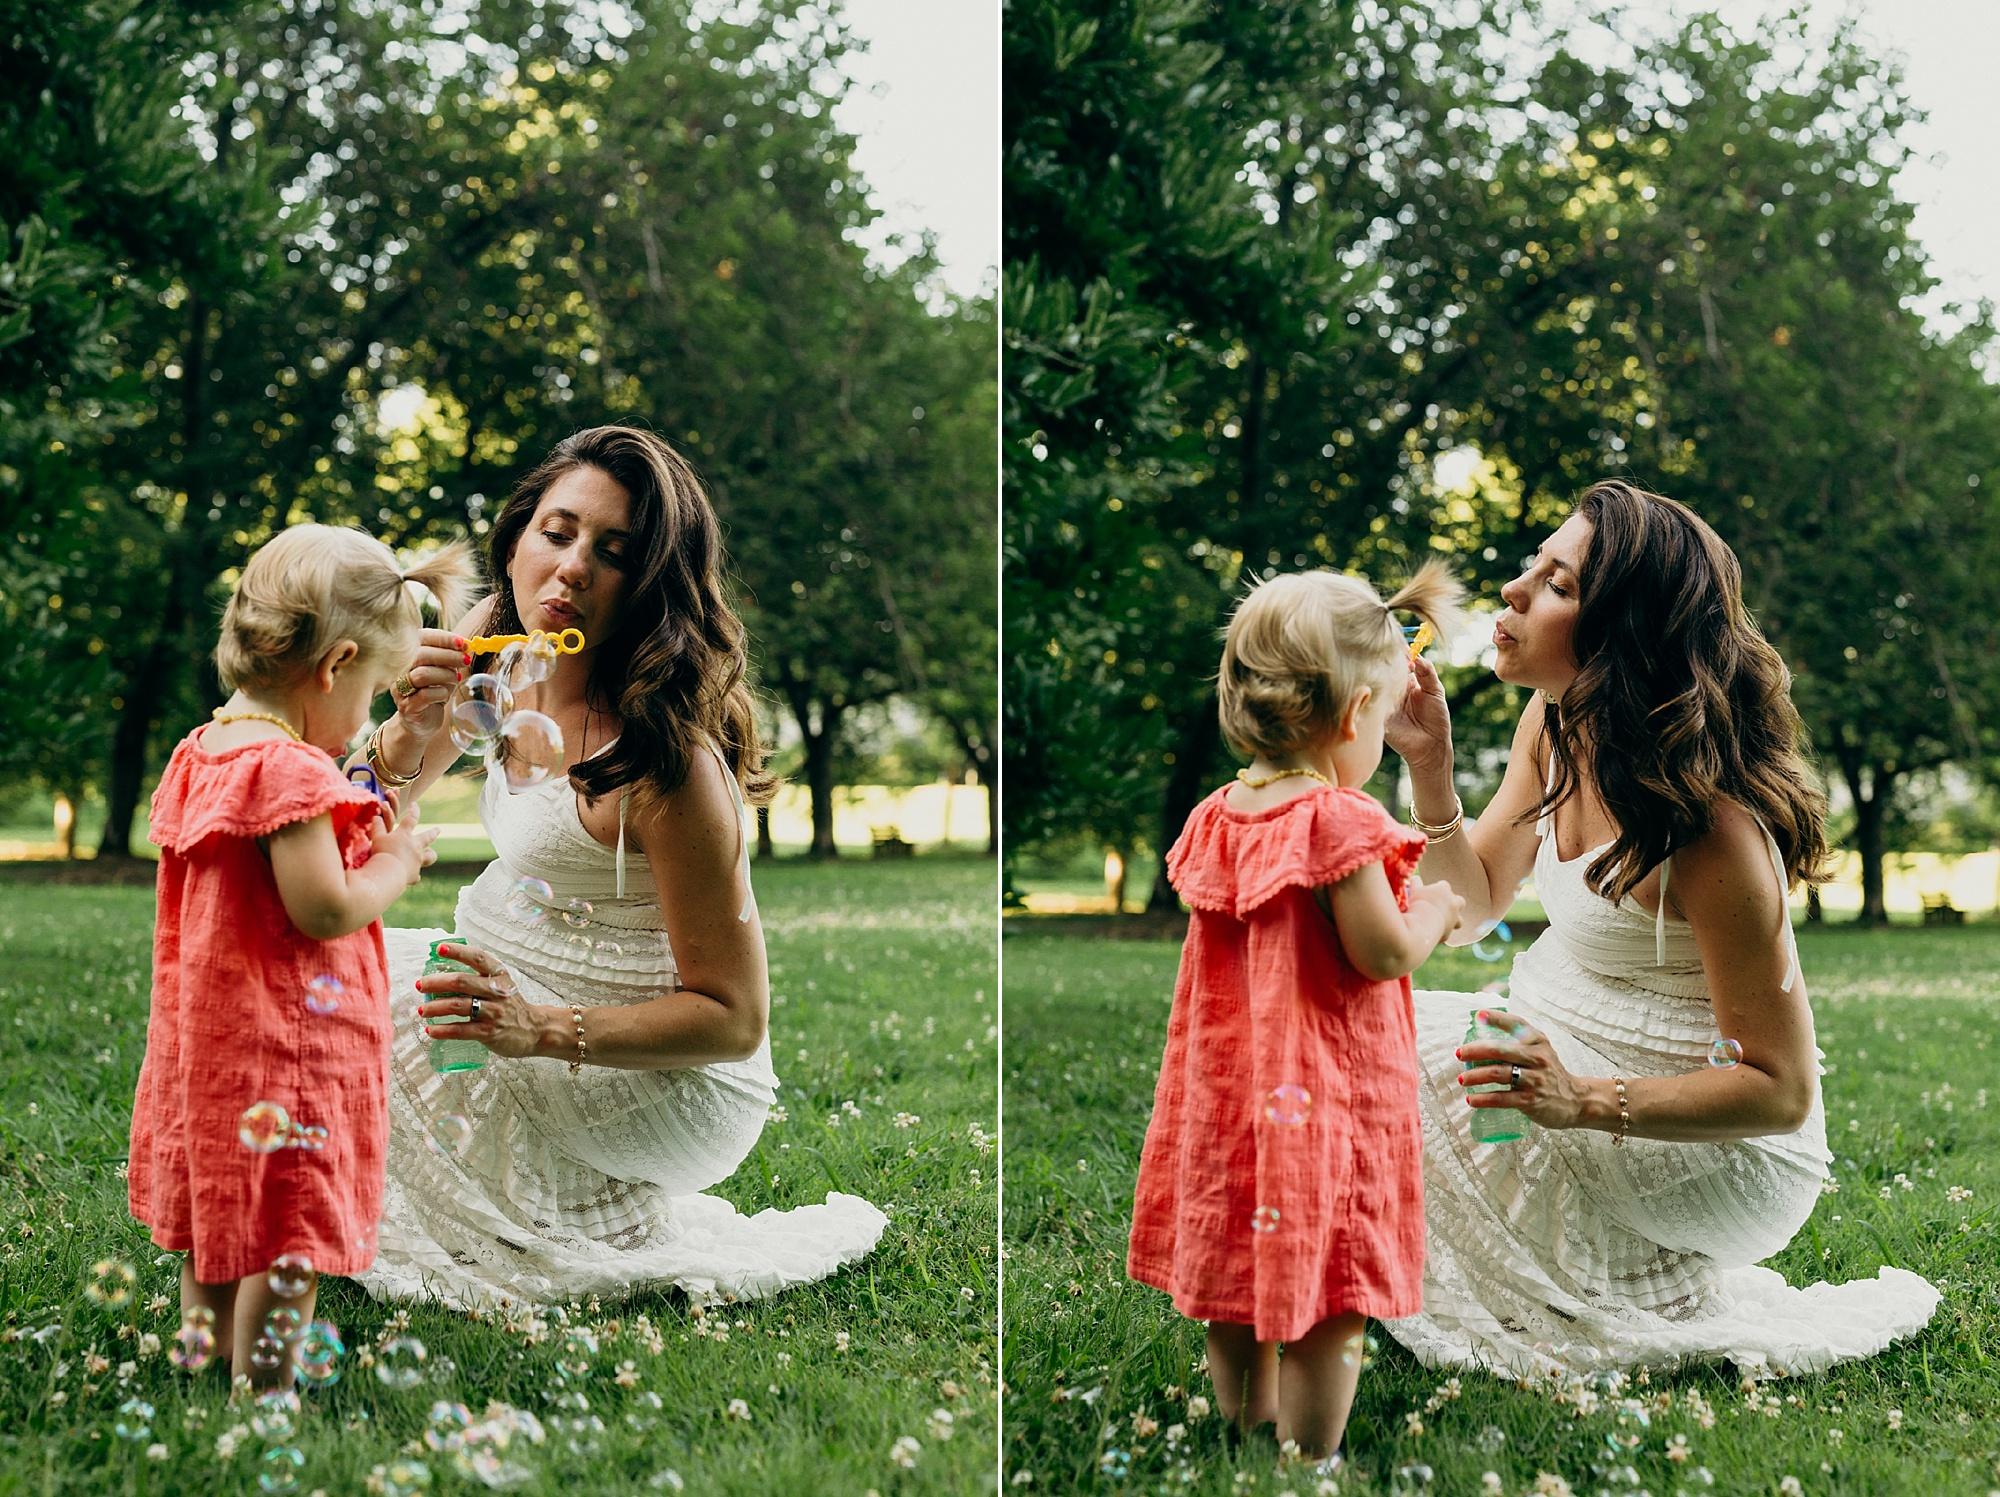 Joe_Mac_Creative_Maternity_West_Chester_Wedding_Photography_Philly_Best_Philadlephia__0160.jpg